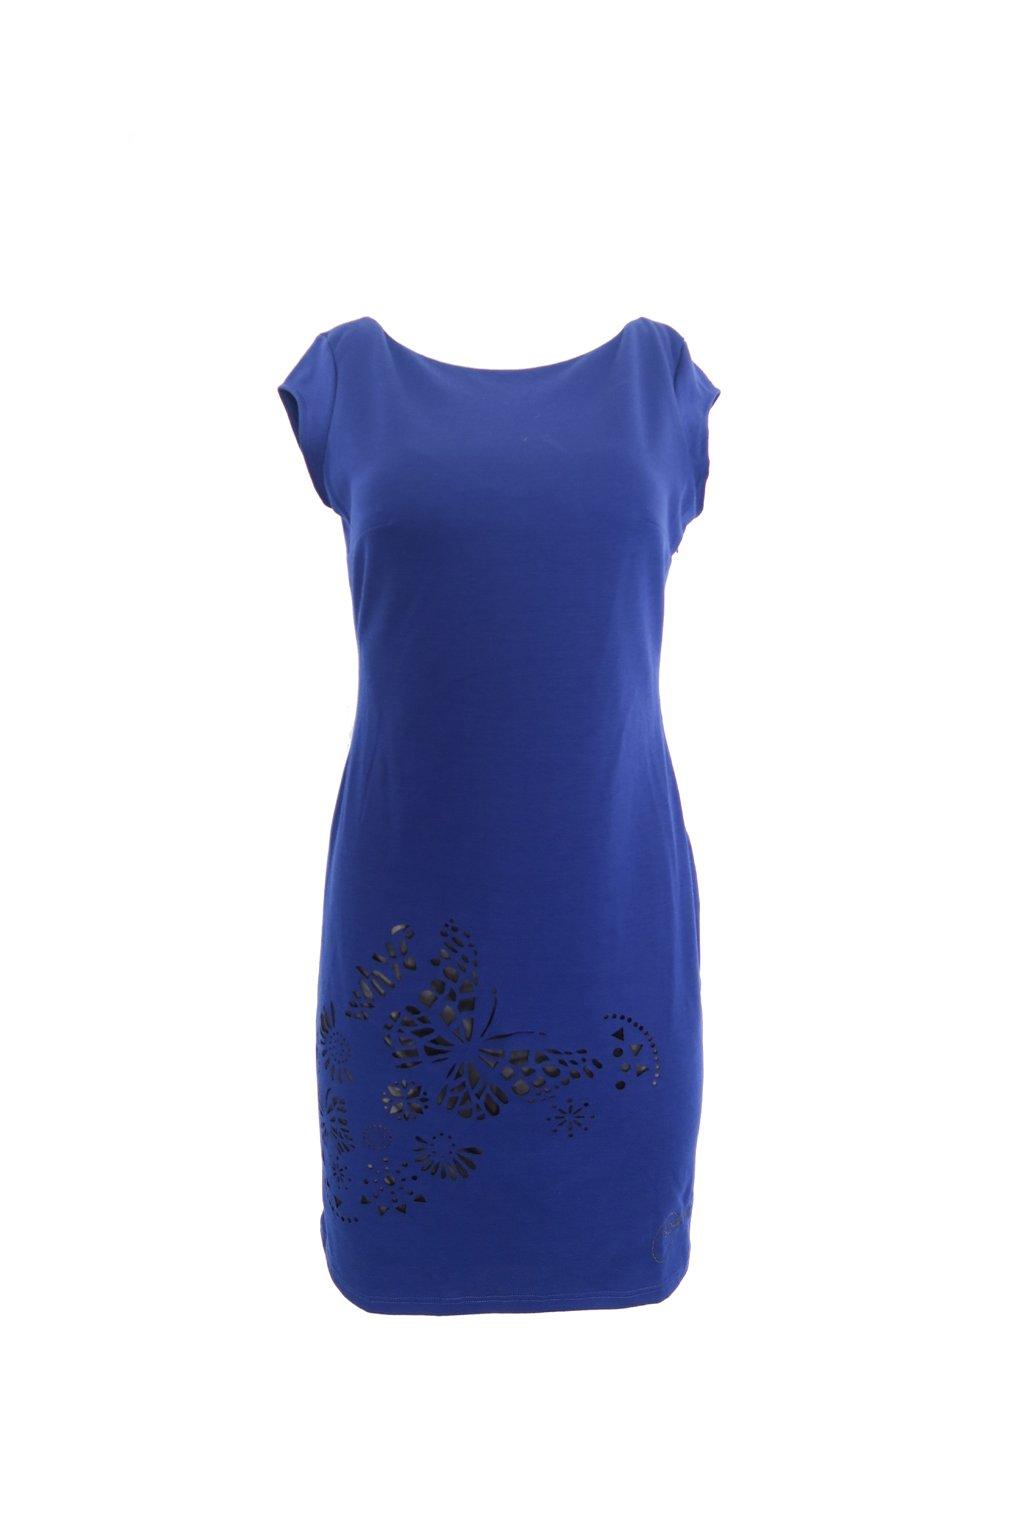 Desigual šaty s motýlkem